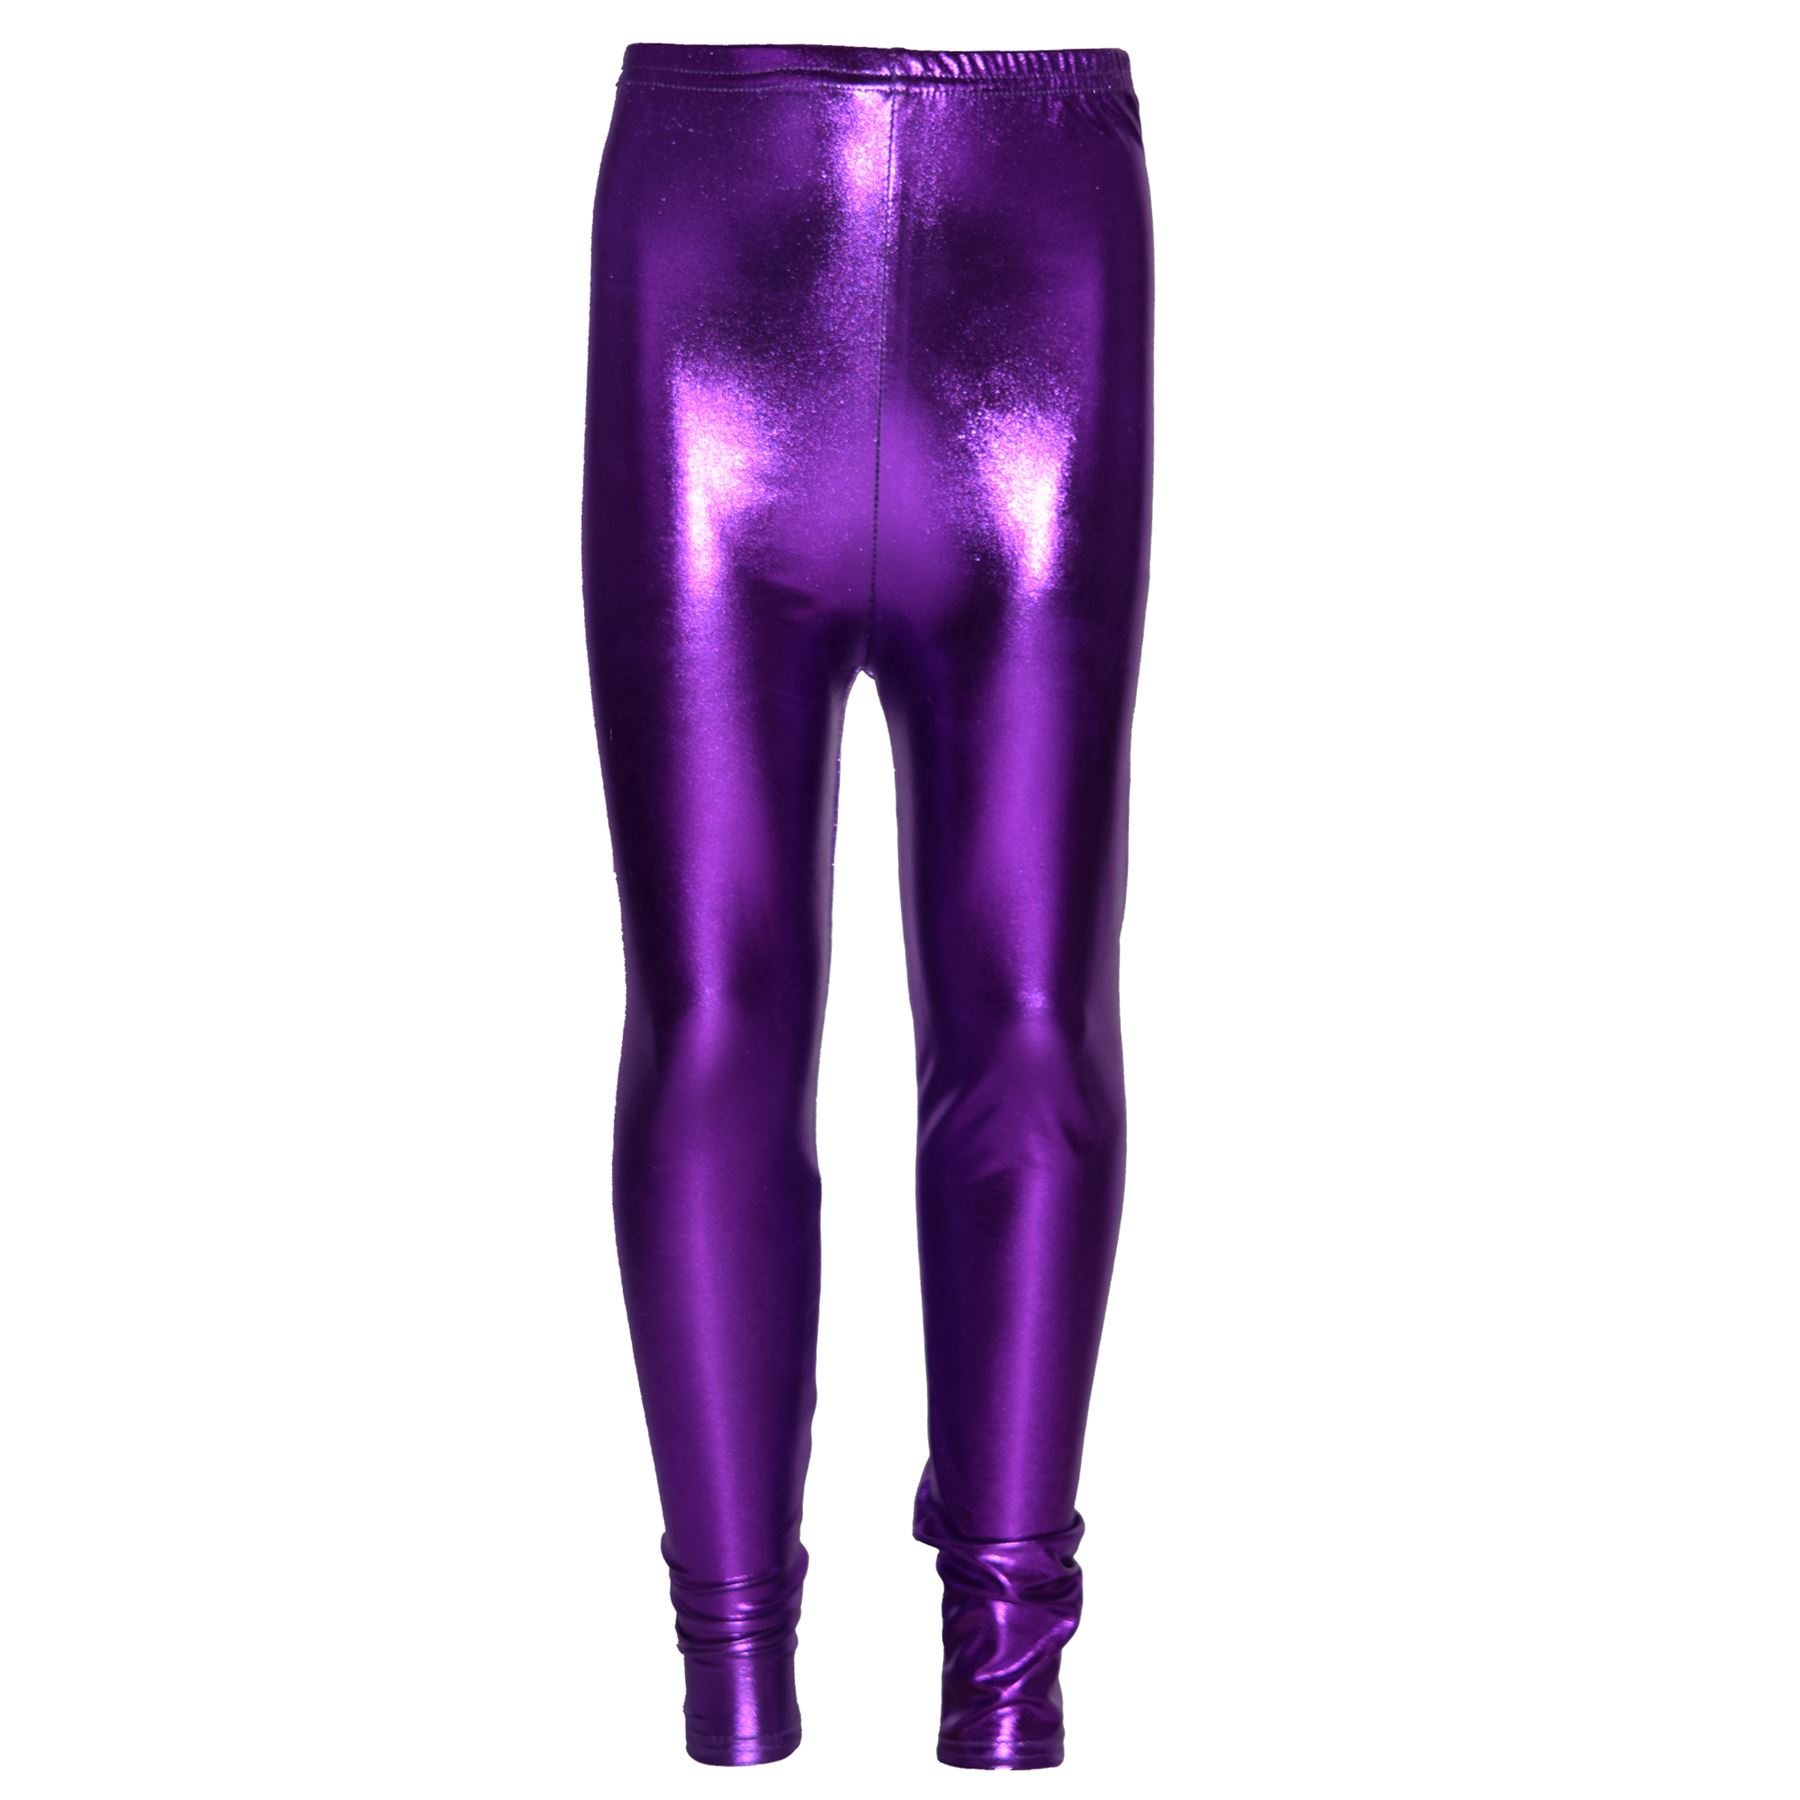 kinder leggings m dchen metallic gl nzend disco mode tanz alter 4 13 jahre. Black Bedroom Furniture Sets. Home Design Ideas